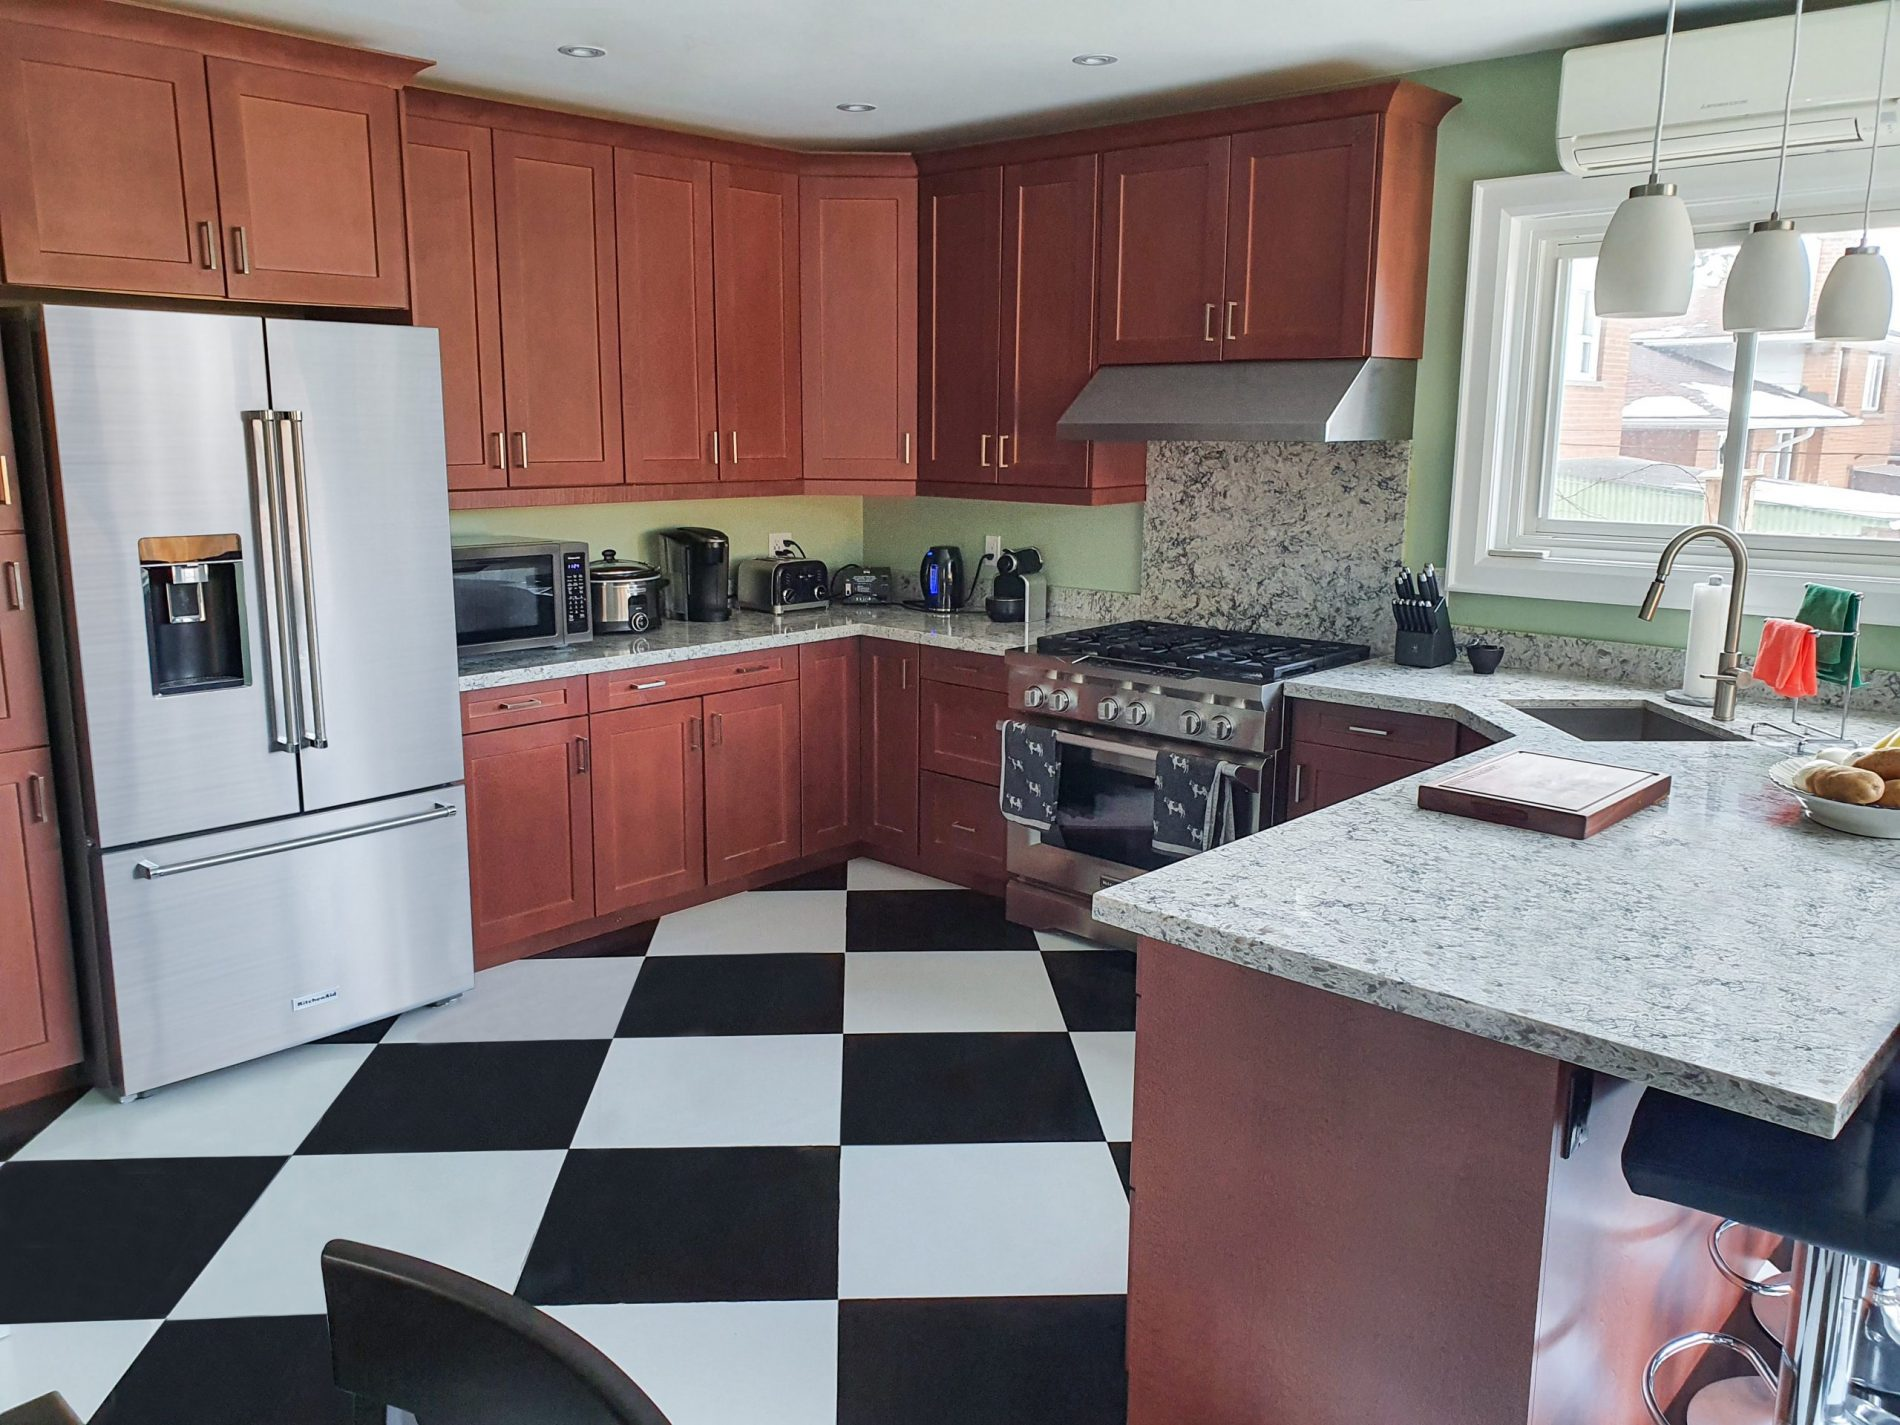 Woodthorpe Rd. – Victoria Park Village Toronto Kitchen Renovation - Featured Image